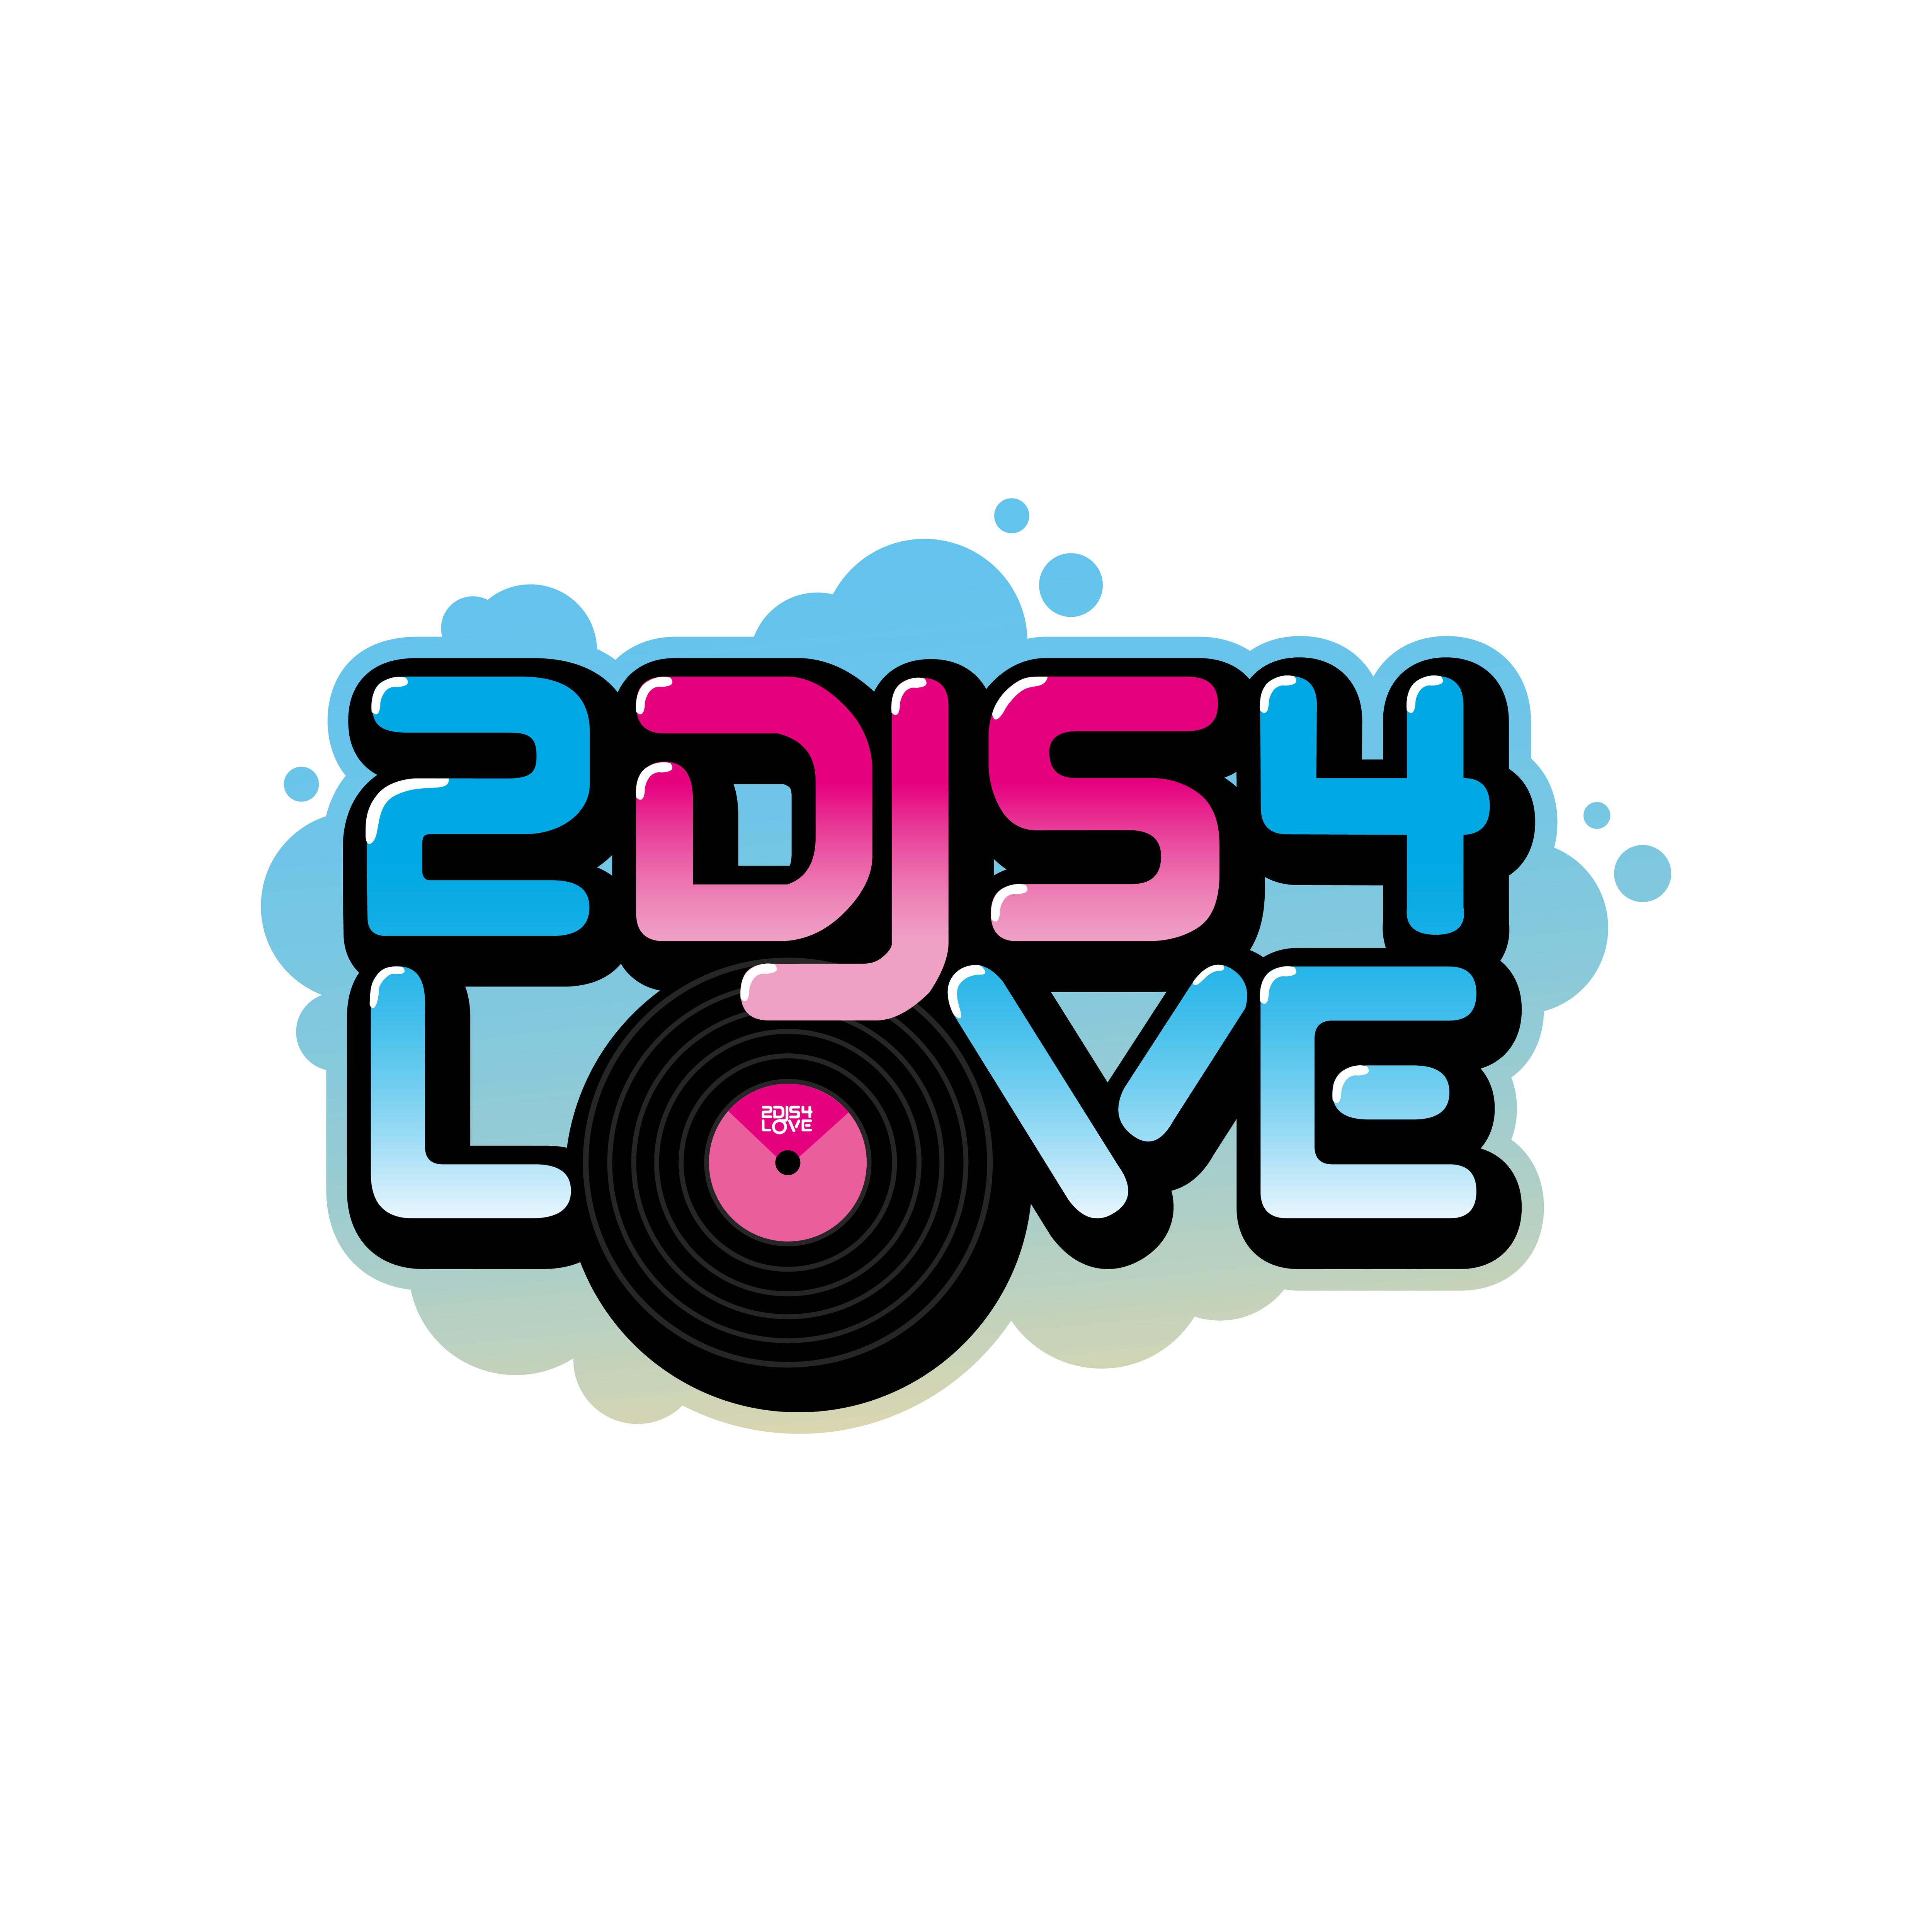 2Djs4 Love